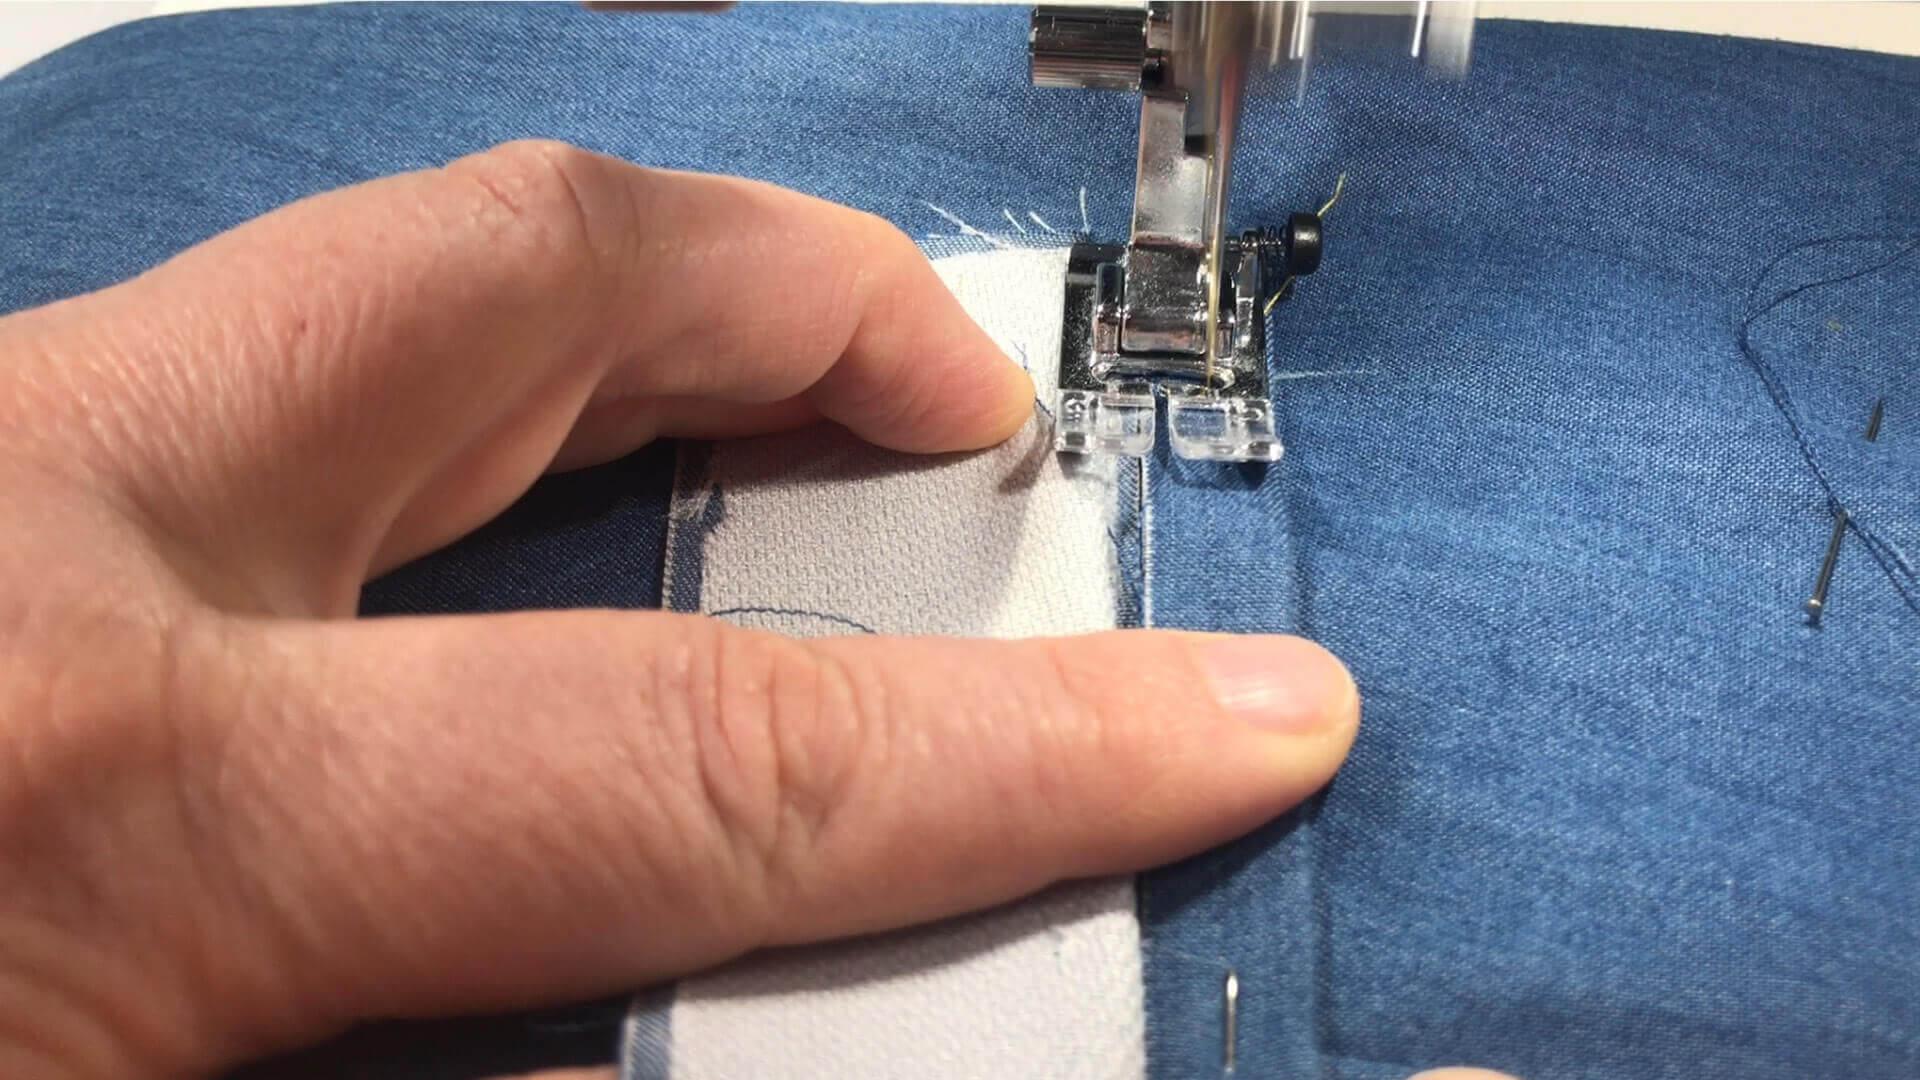 Nähanleitung Doppelpaspeltasche- Taschenpaspel aufsteppen